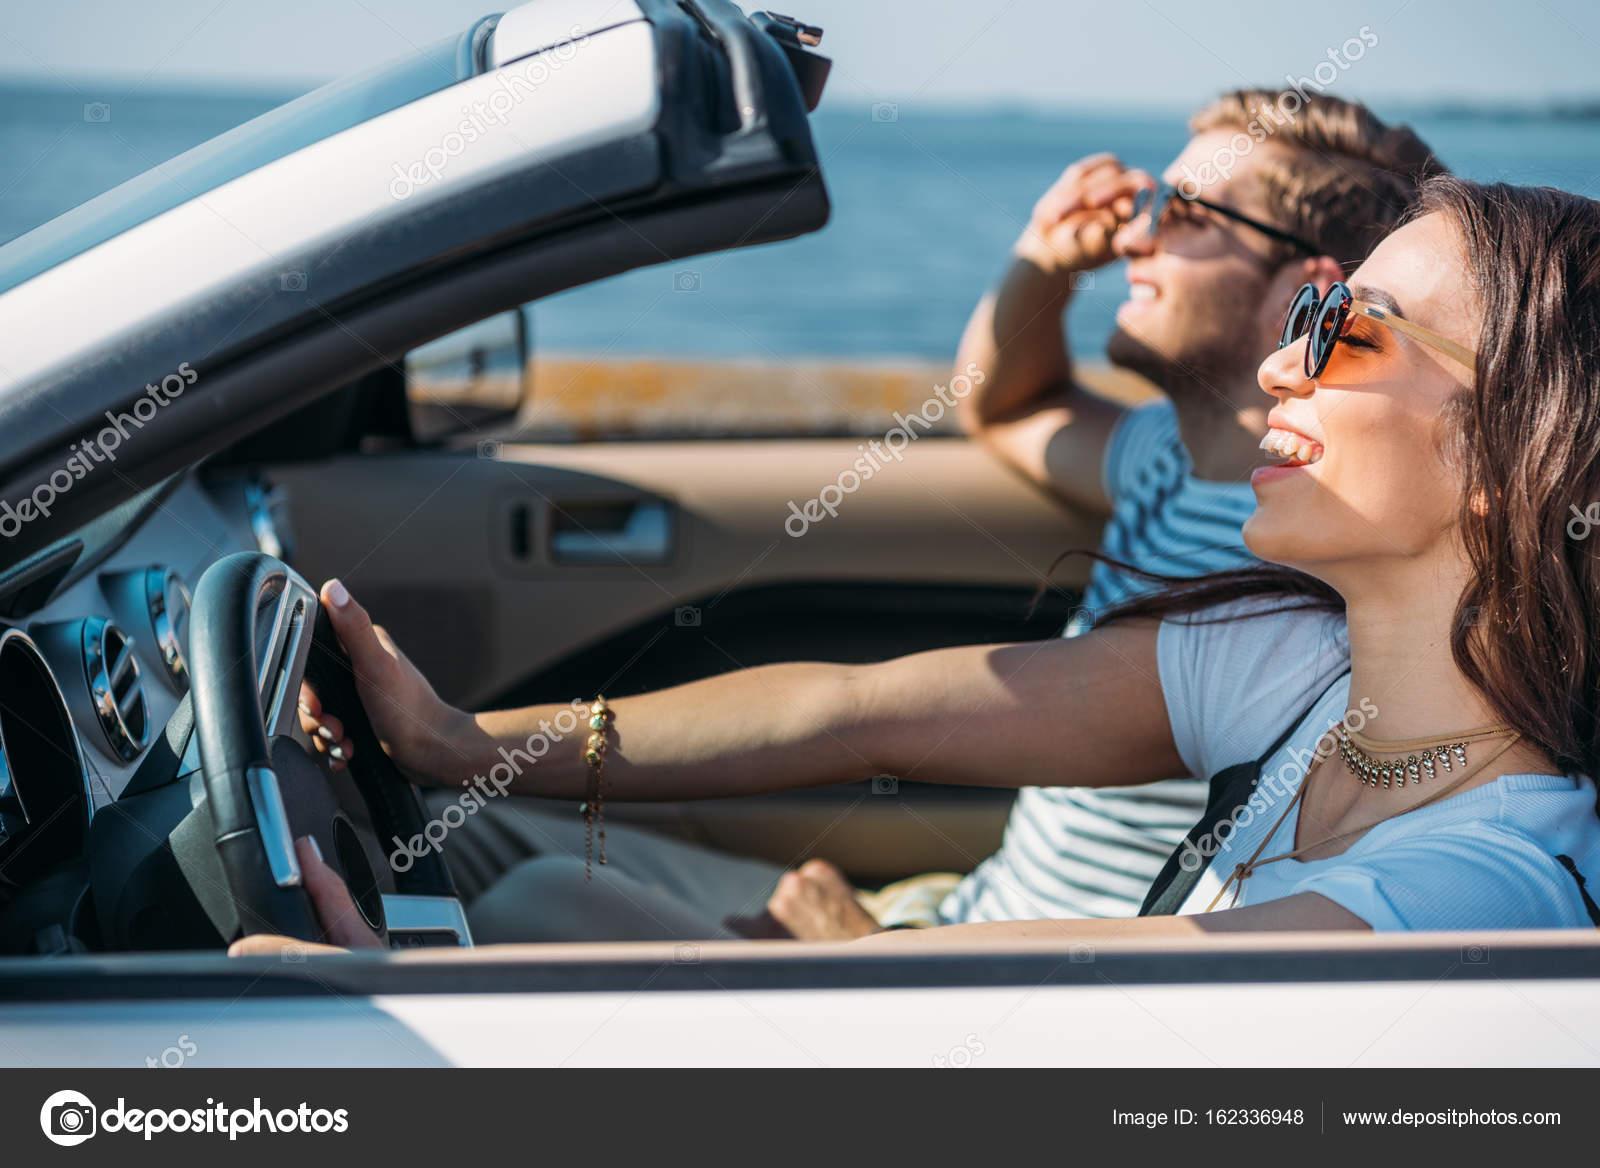 Pictures Car Couple Couple Riding Car Together Stock Photo C Arturverkhovetskiy 162336948